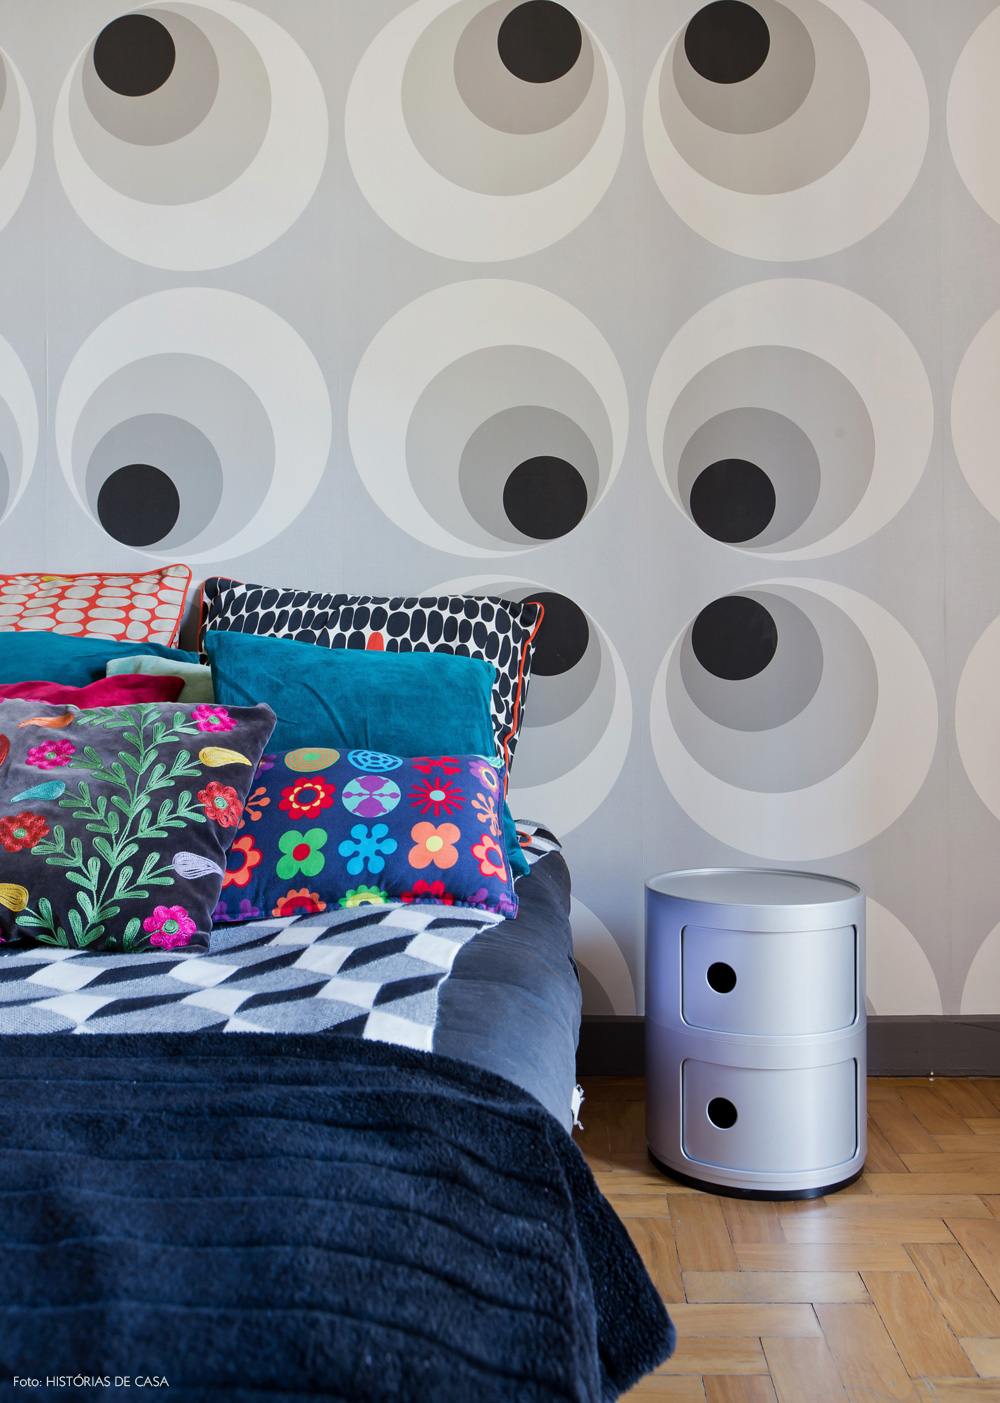 28-decoracao-cama-estampada-papel-parede-retro